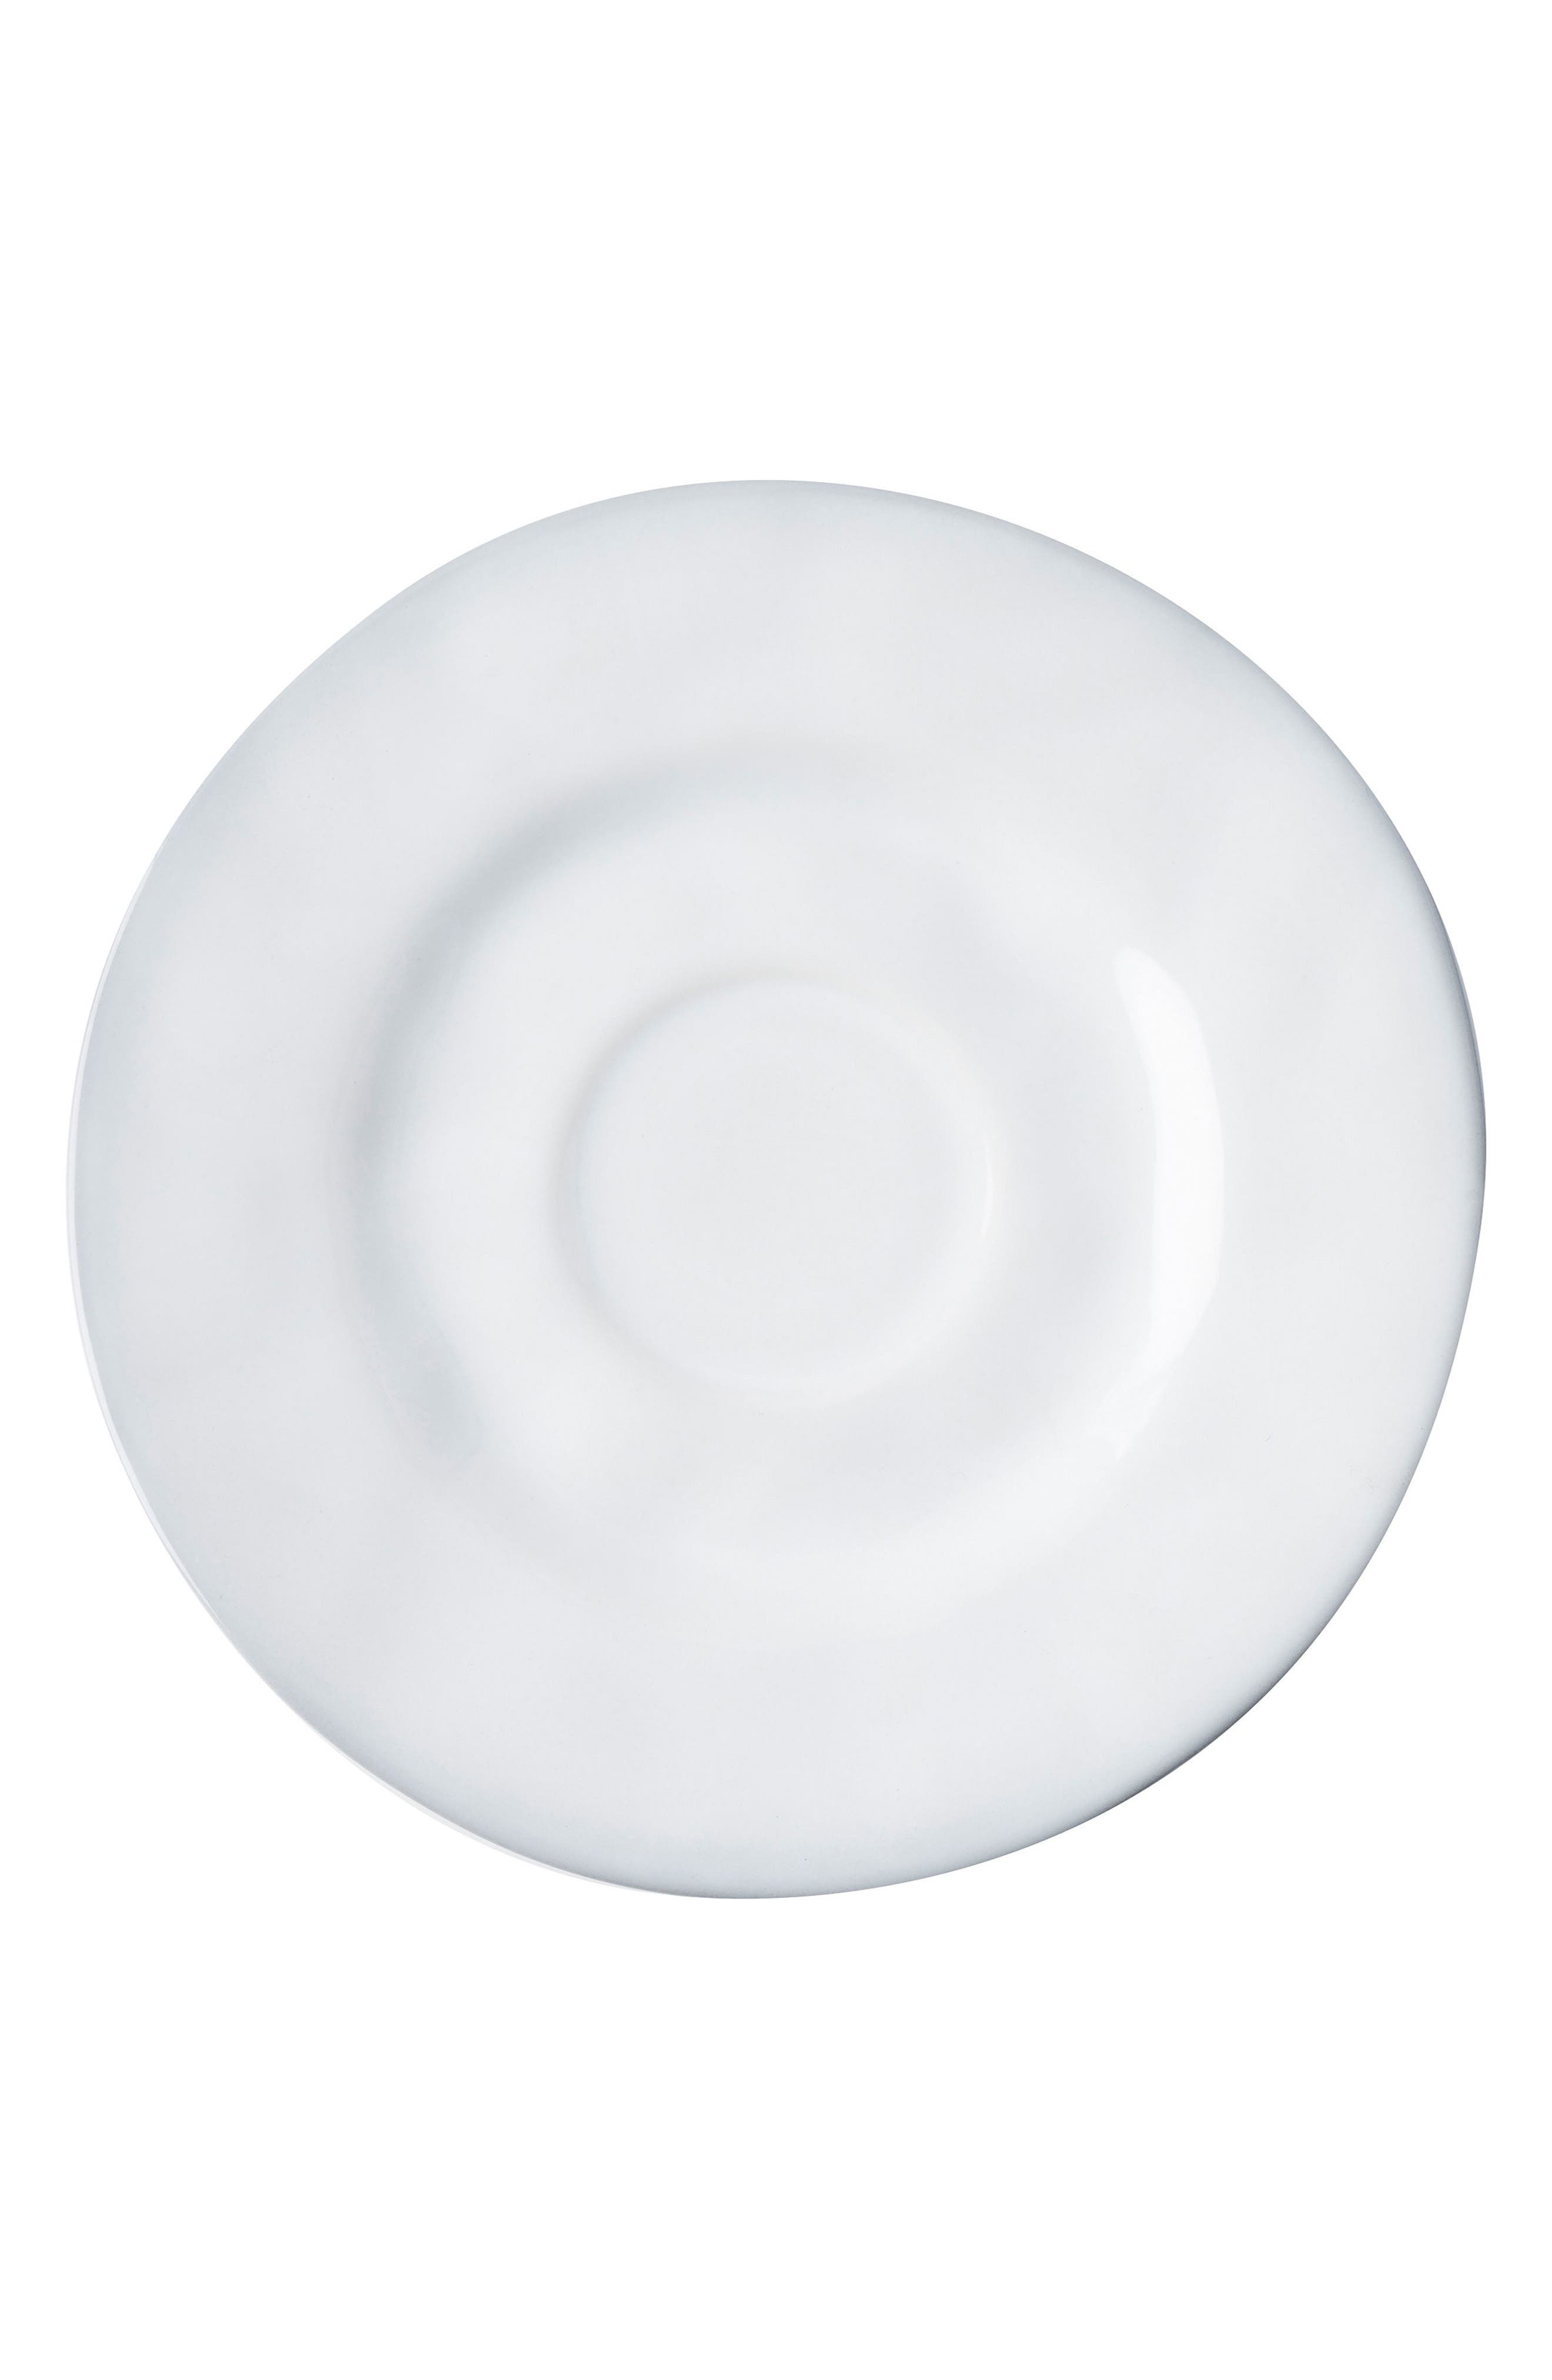 Quotidien White Truffle Ceramic Saucer,                         Main,                         color, White Truffle